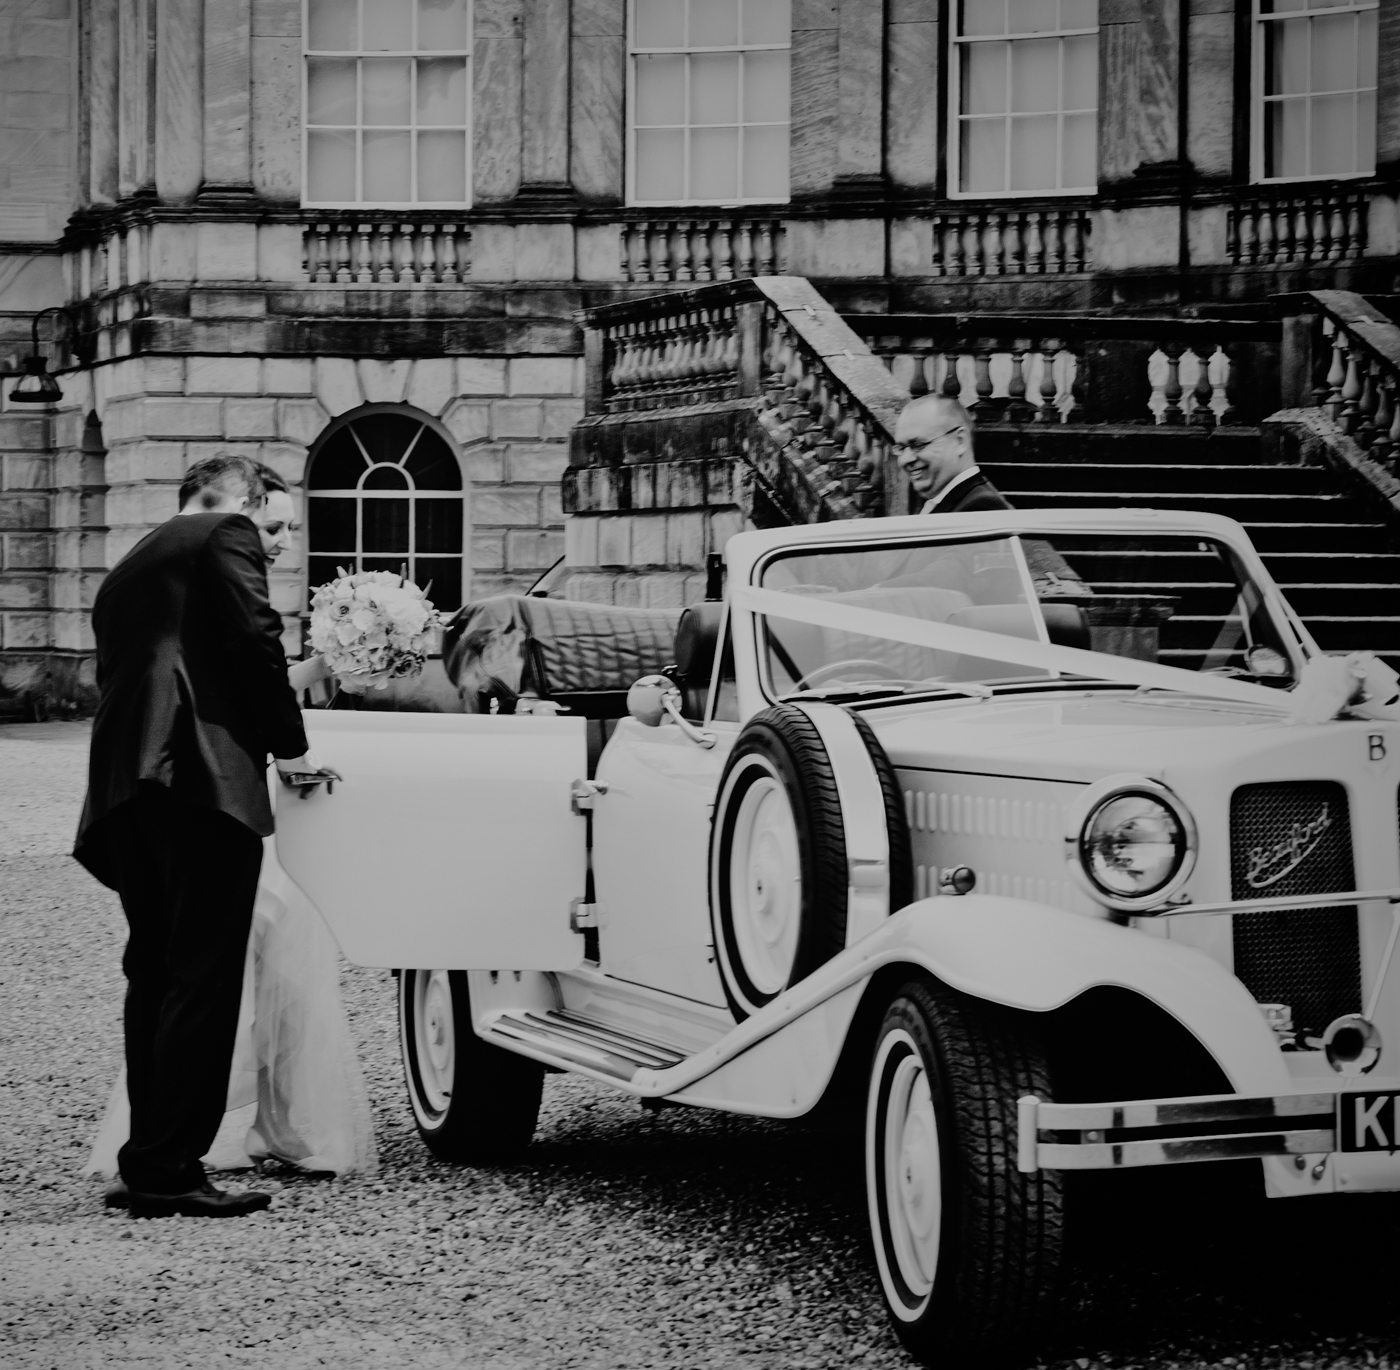 107 - Abi and Chris at Kedleston Hall - Wedding Photography by Mark Pugh www.markpugh.com - 5483.JPG